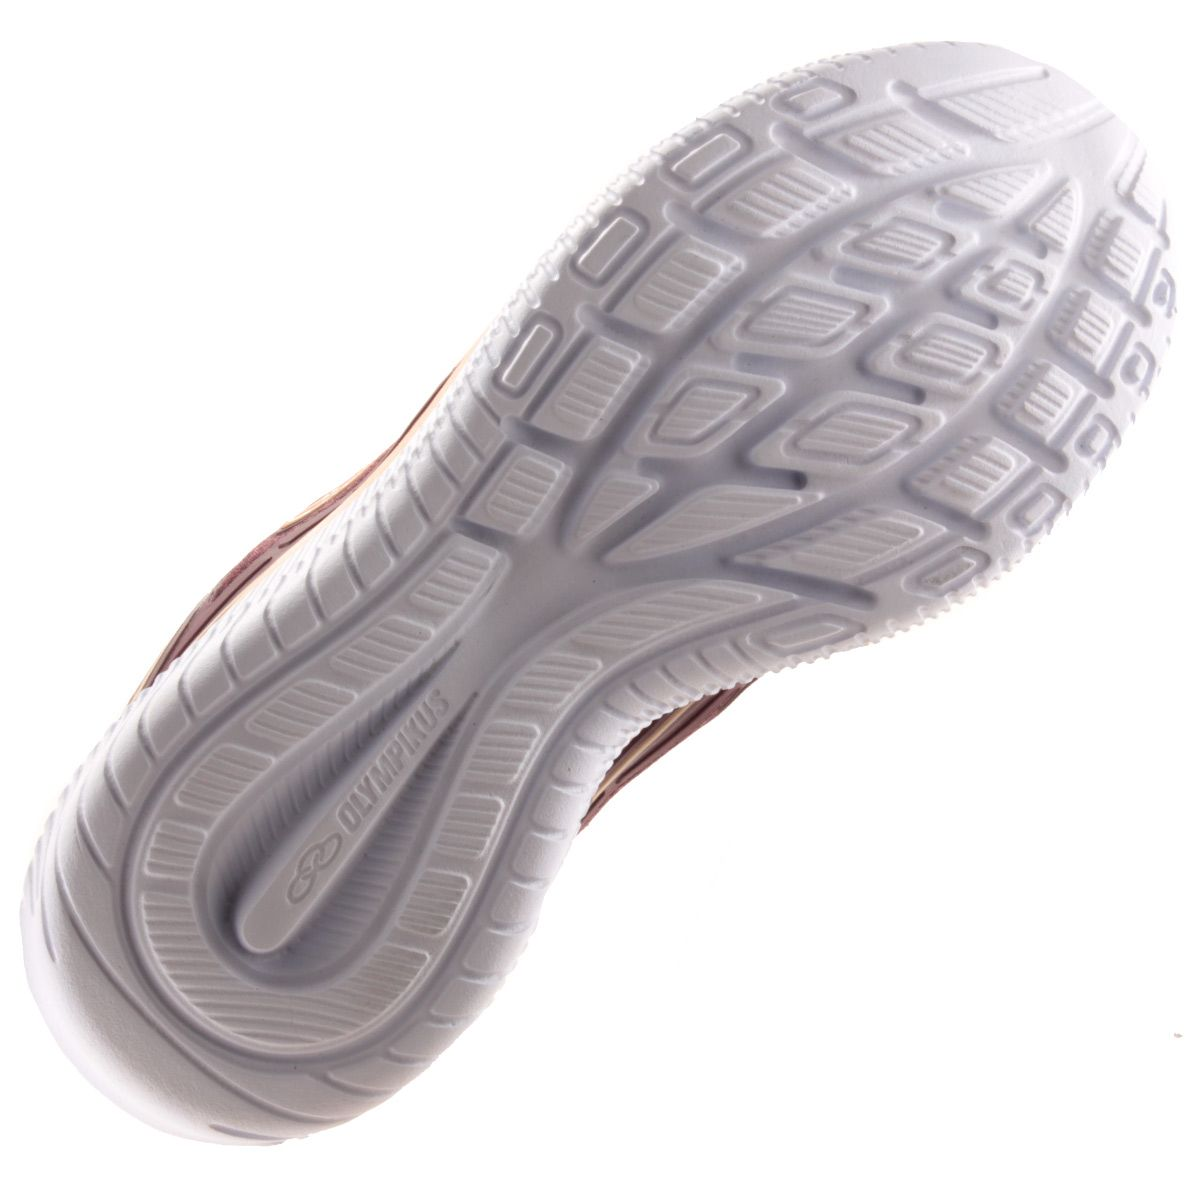 Tênis Olympikus Actual Feminino Caminhada Corrida 422  - Ian Calçados